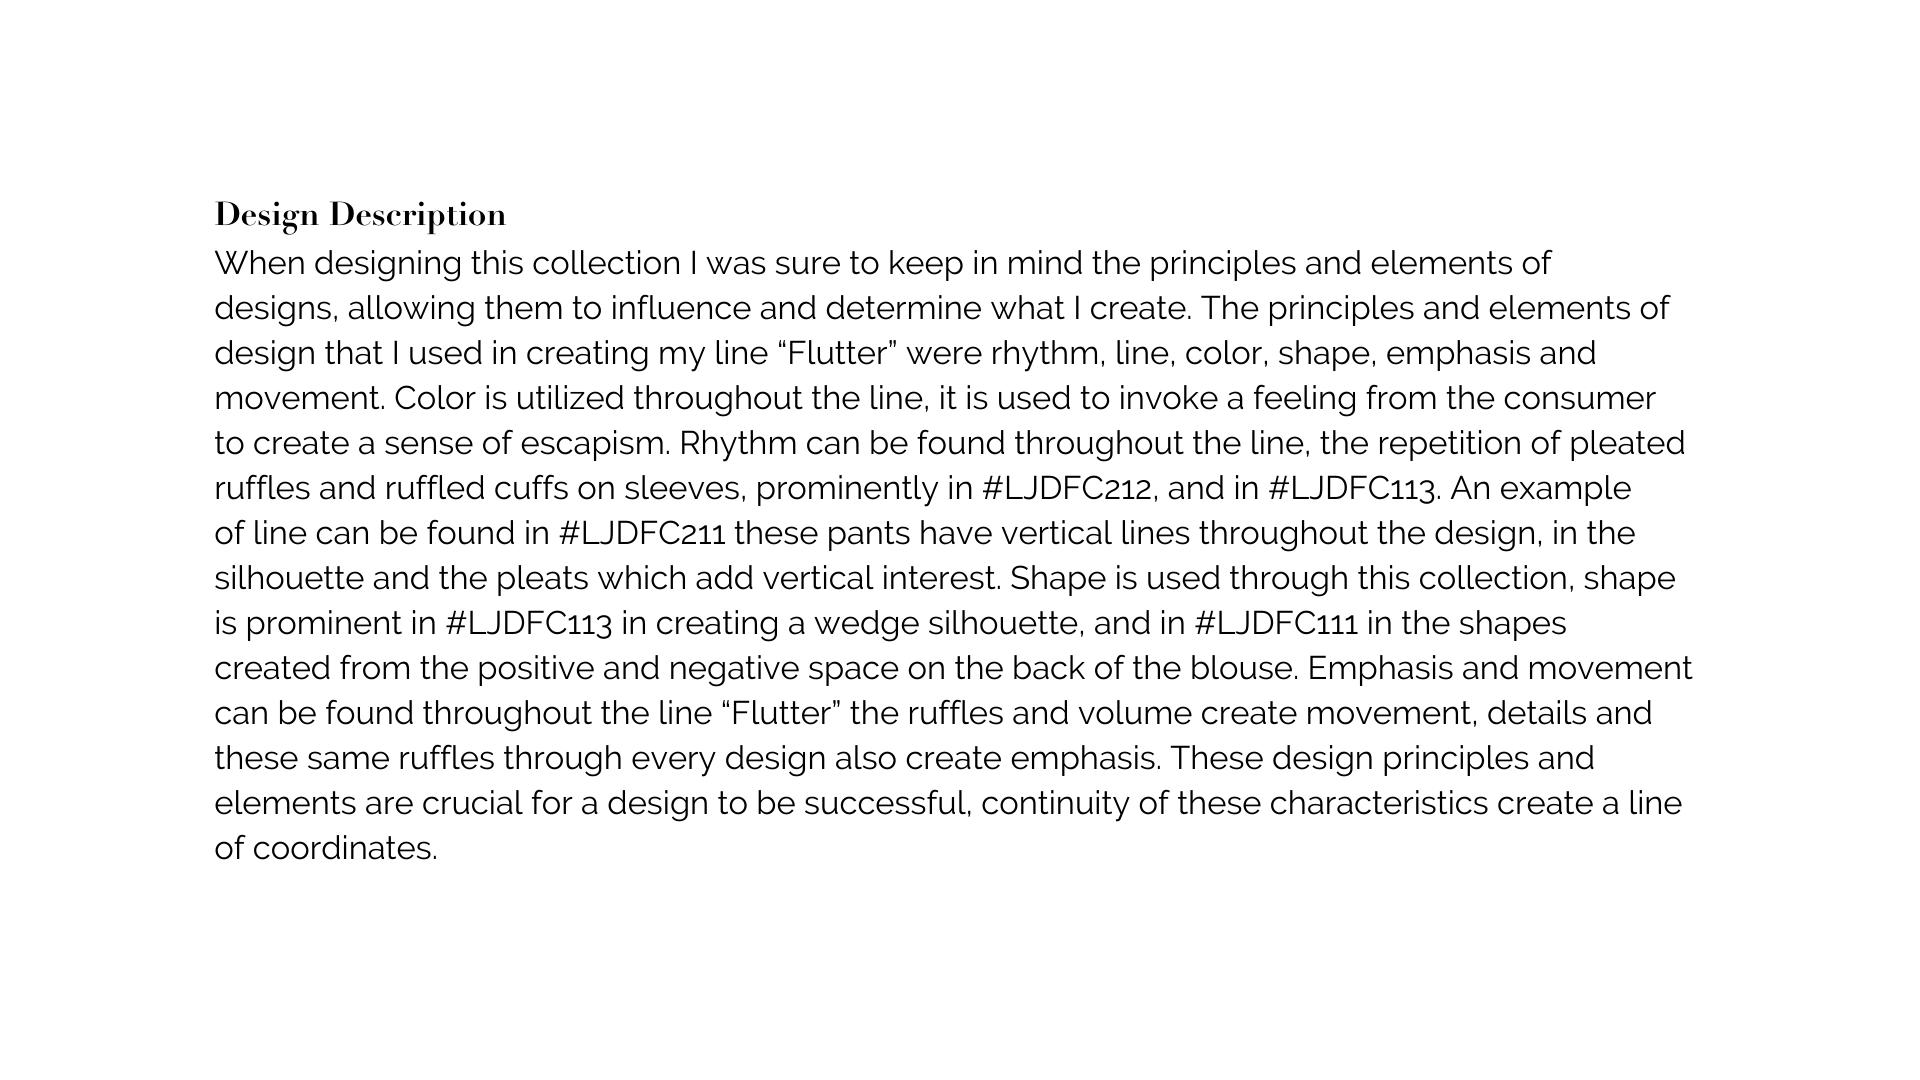 Design Description | Explanation